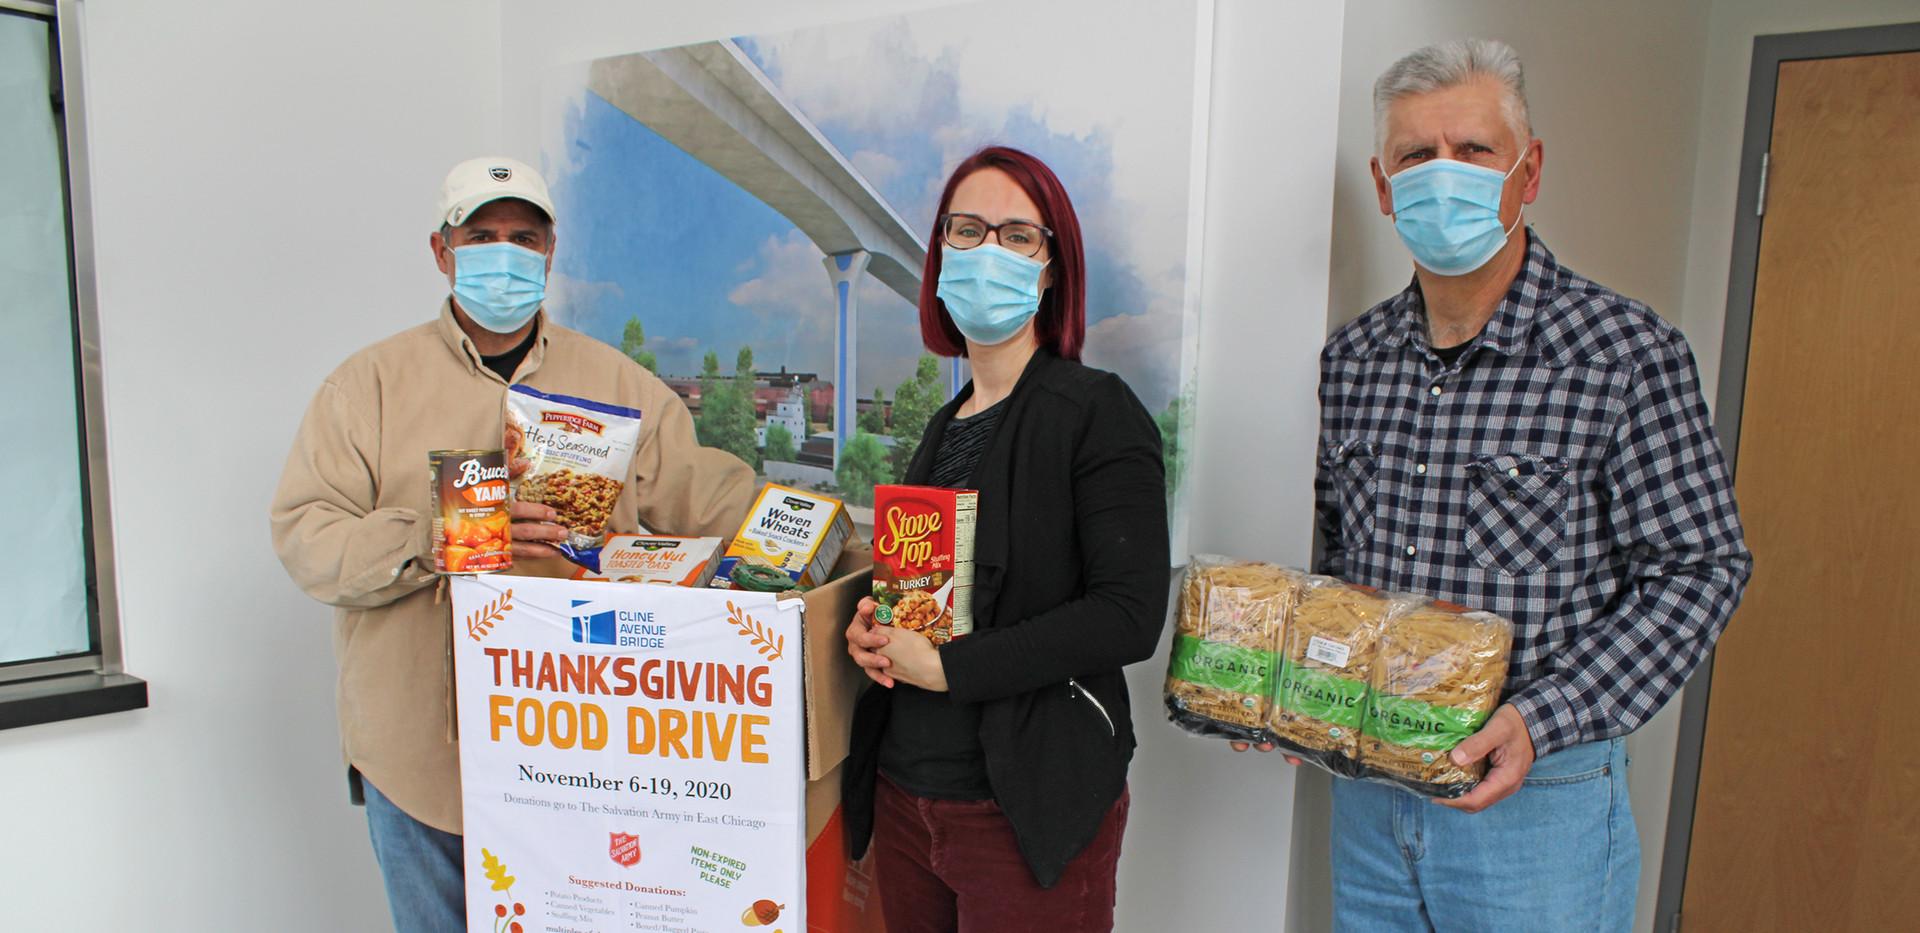 2020 Thanksgiving Food Drive